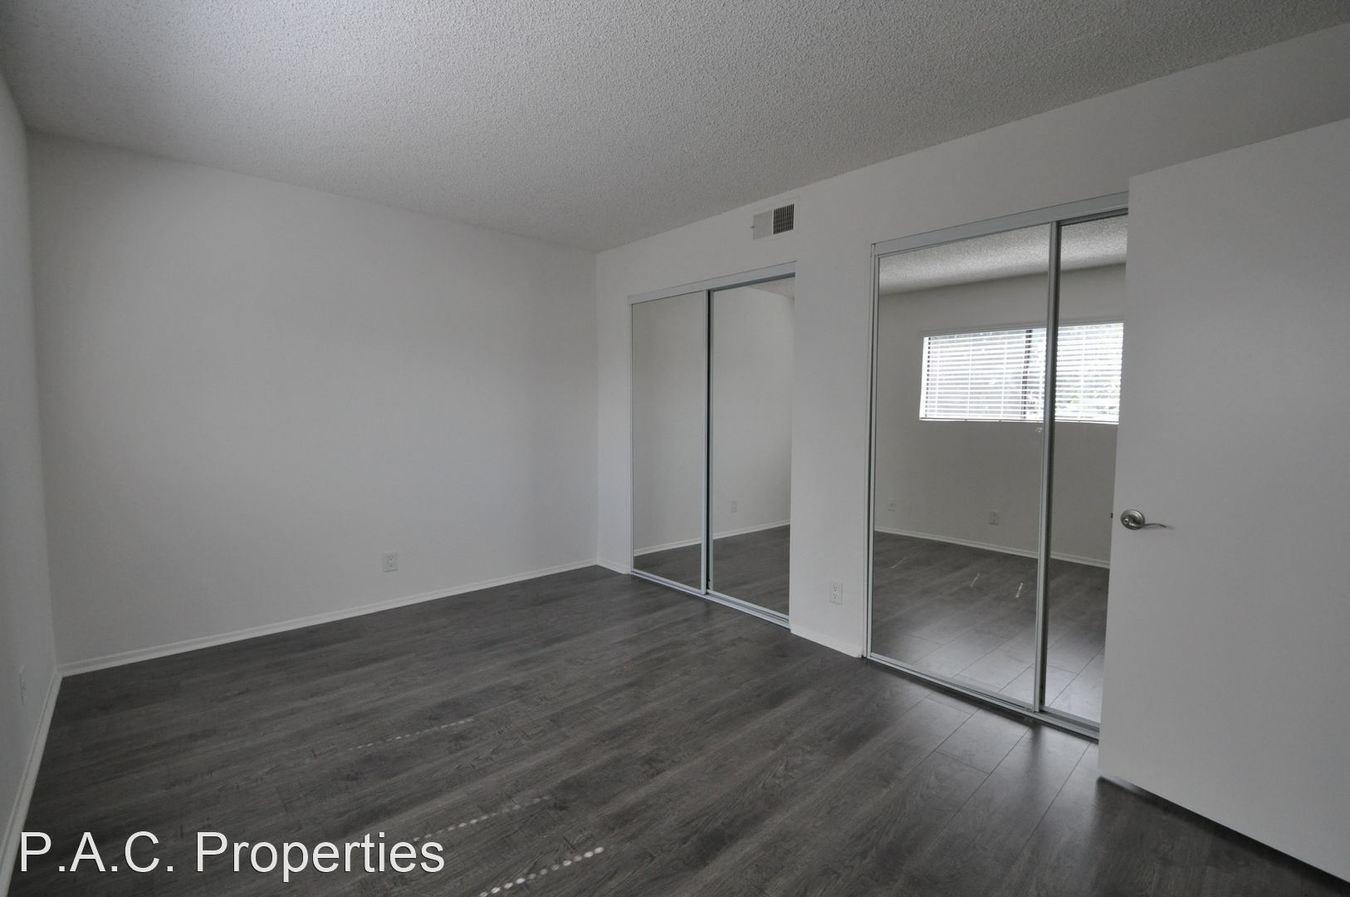 1 Bedroom 1 Bathroom Apartment for rent at 12255 Burbank Blvd in Valley Village, CA